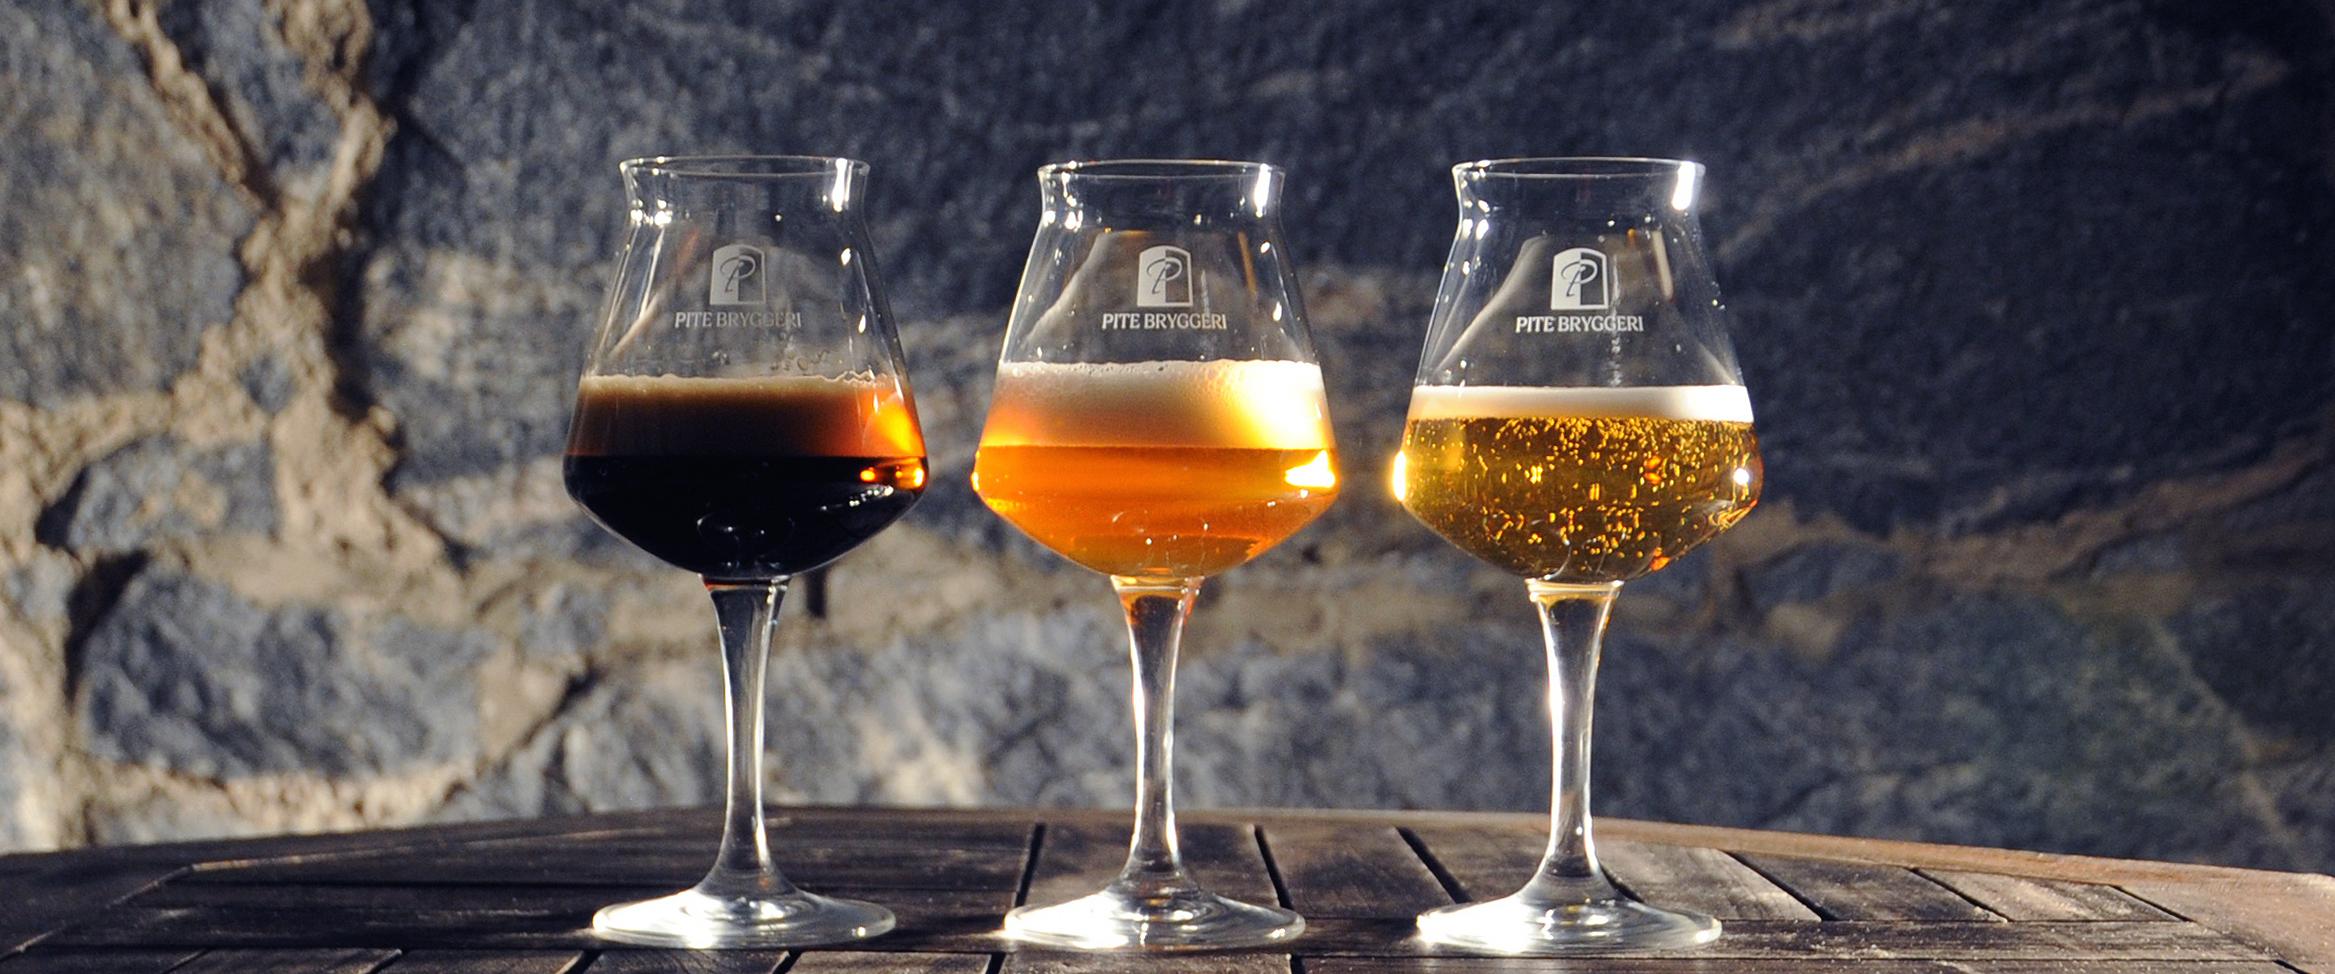 Tre olika sorters öl att prova hos Pite Bryggeri